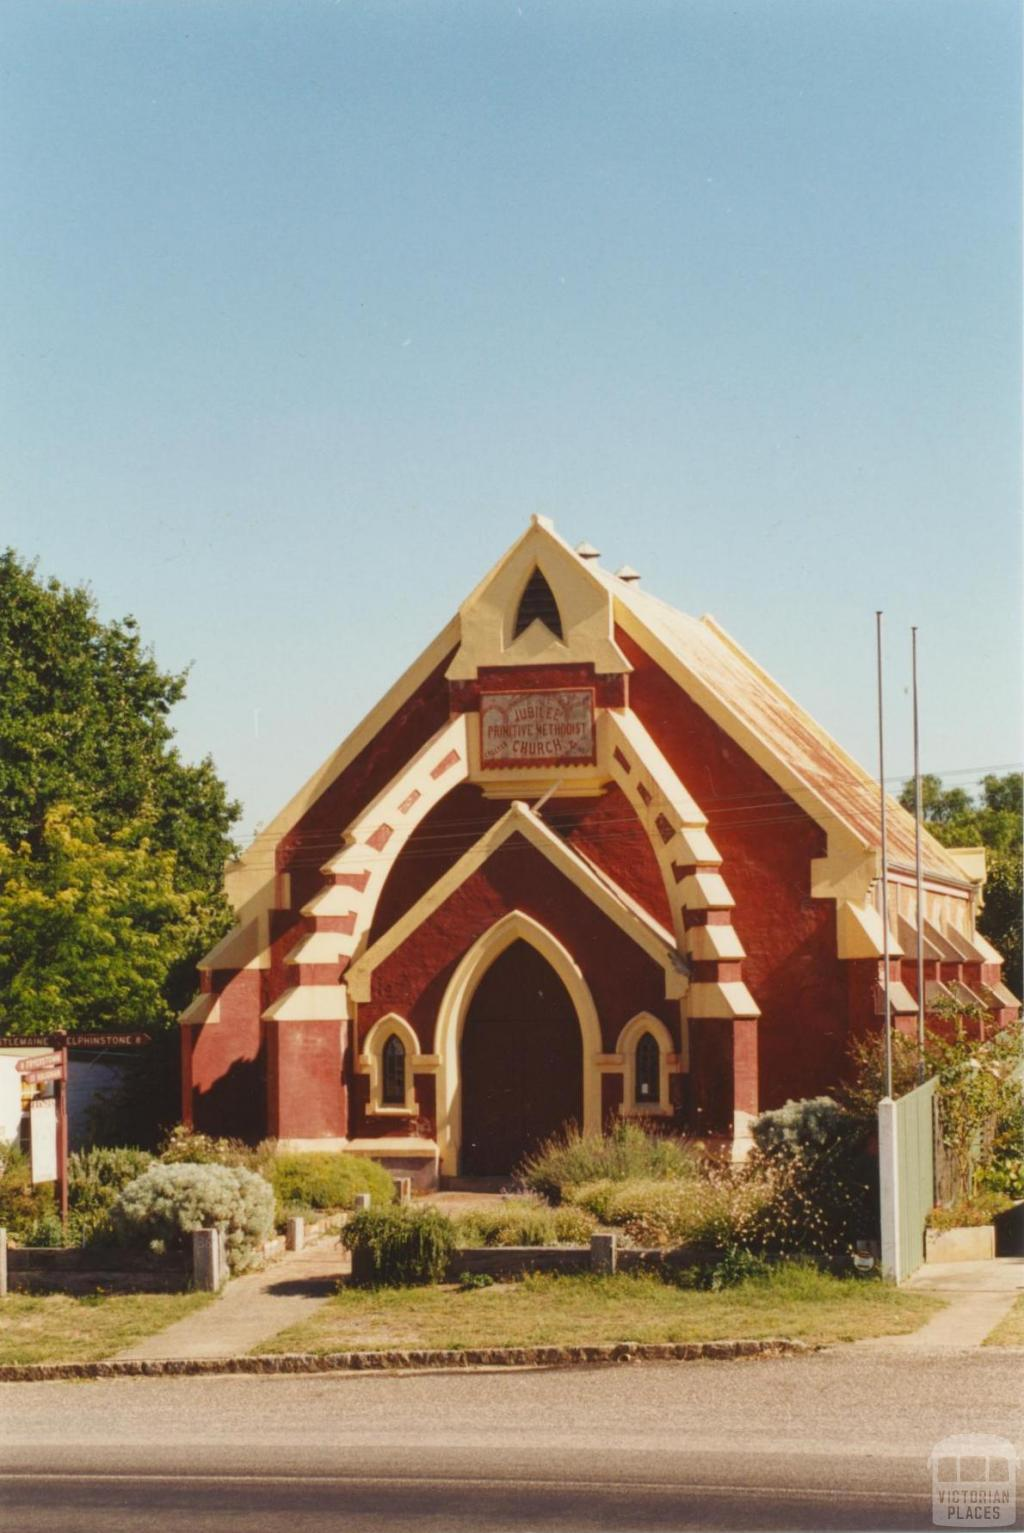 Chewton Primitive Methodist Church, 2001